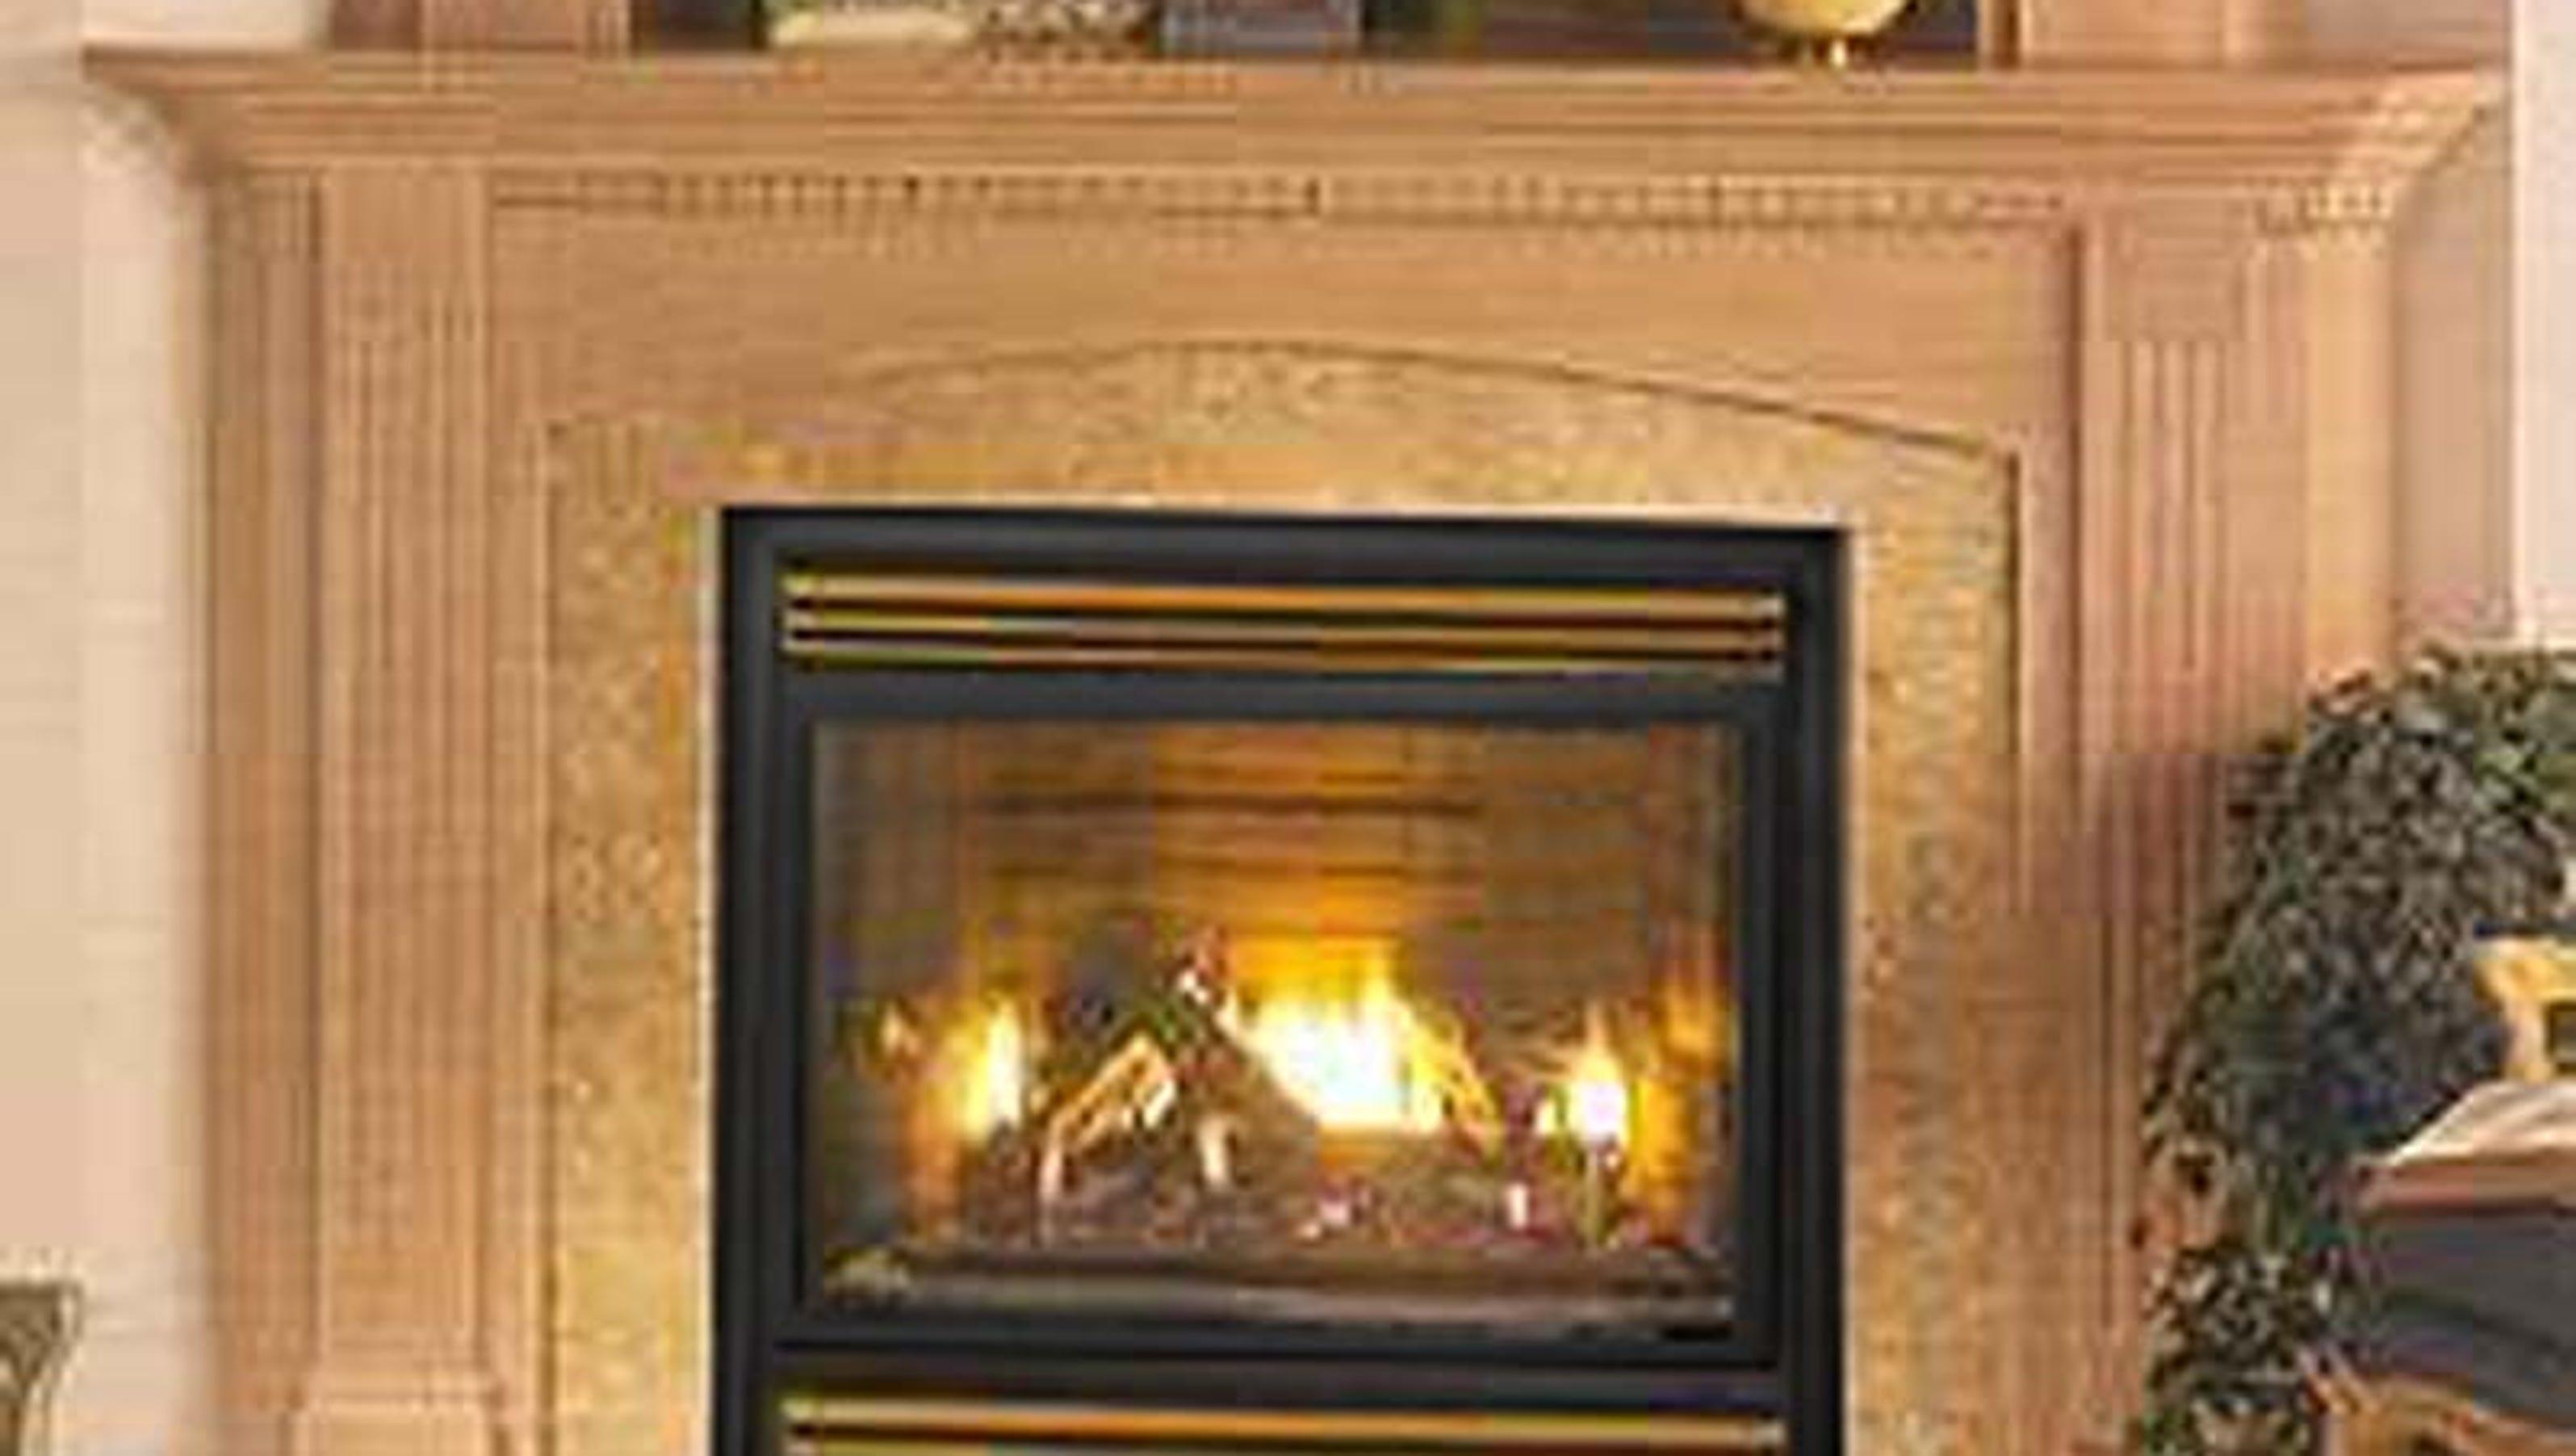 Wolf Steel Recalls Napoleon Propane Gas Fireplaces